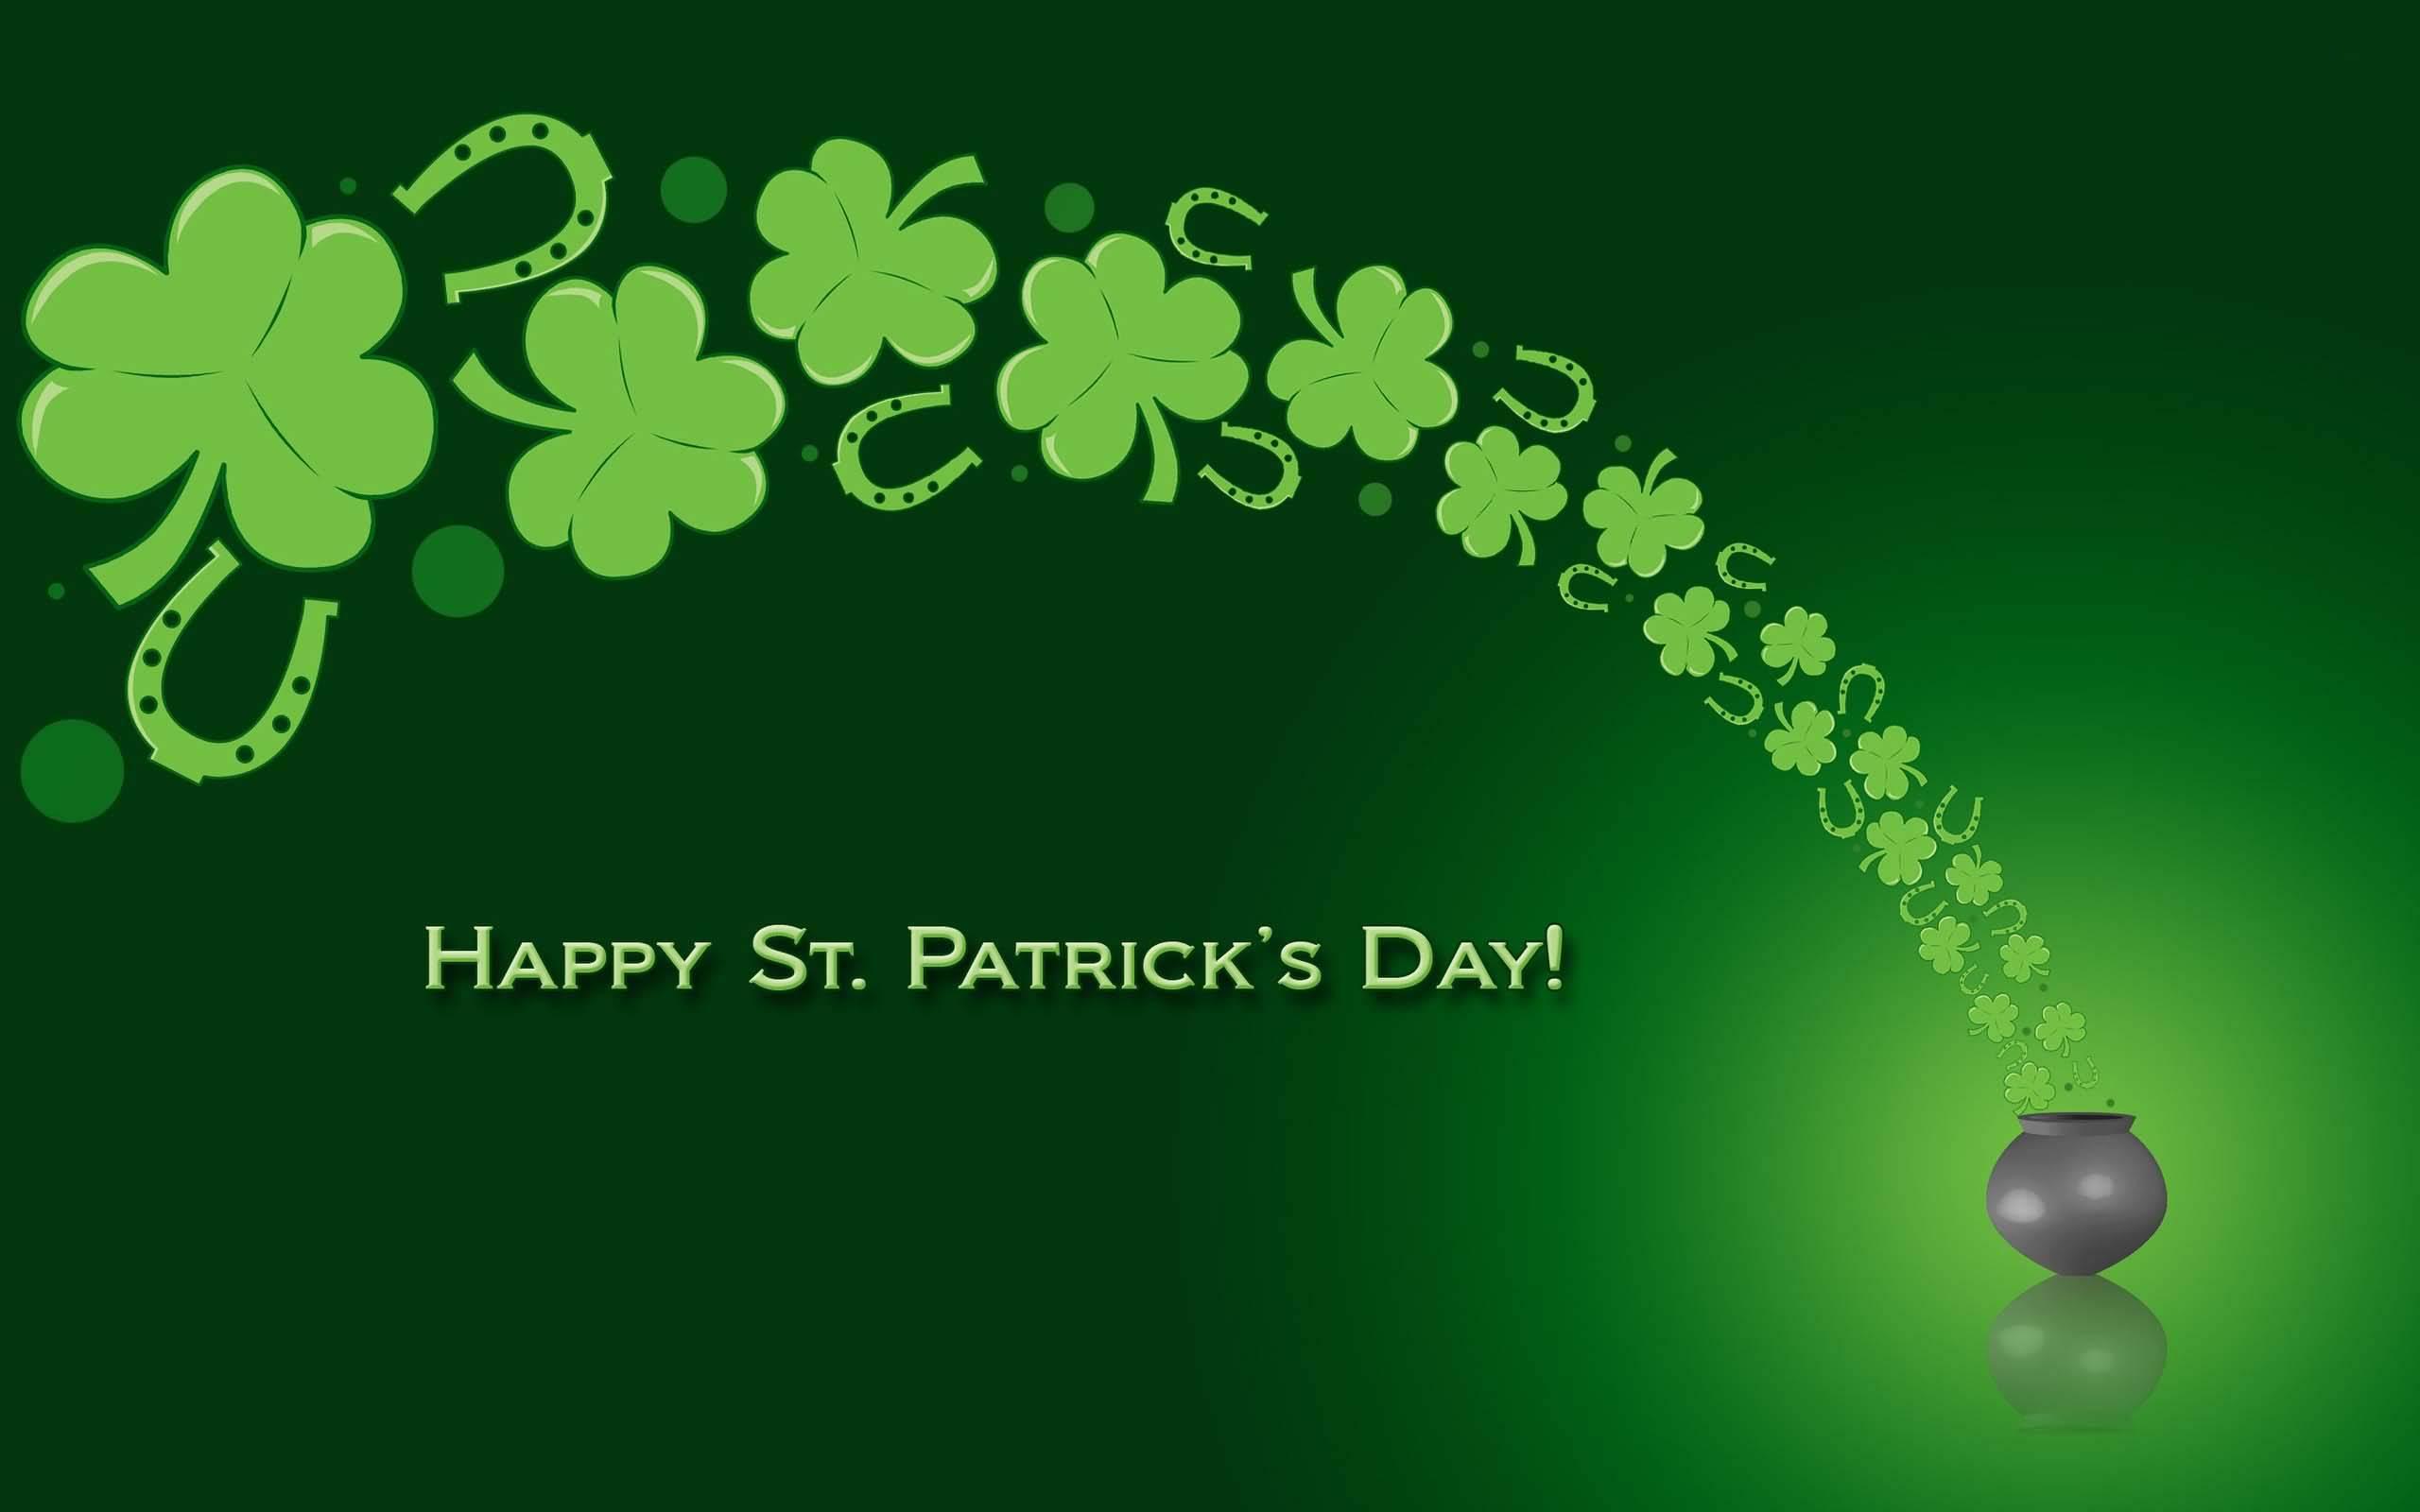 St. Patrick's Day Wish 29